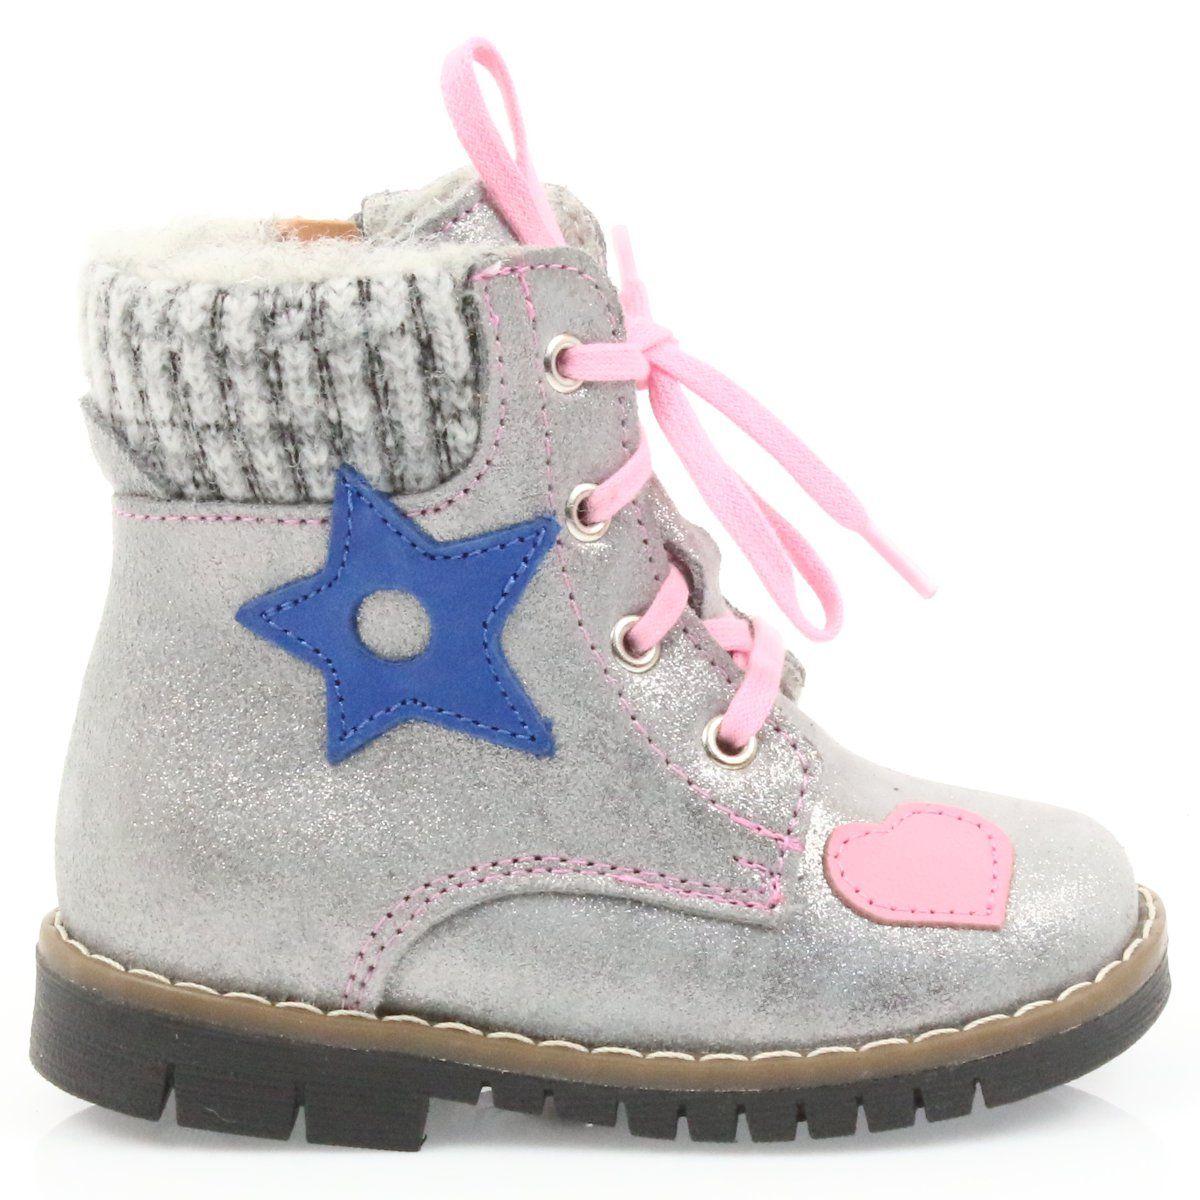 Kozaki Dla Dzieci Renbut Szare Kozaczki Timberki Ren But 1508 Boots Winter Boot Shoes